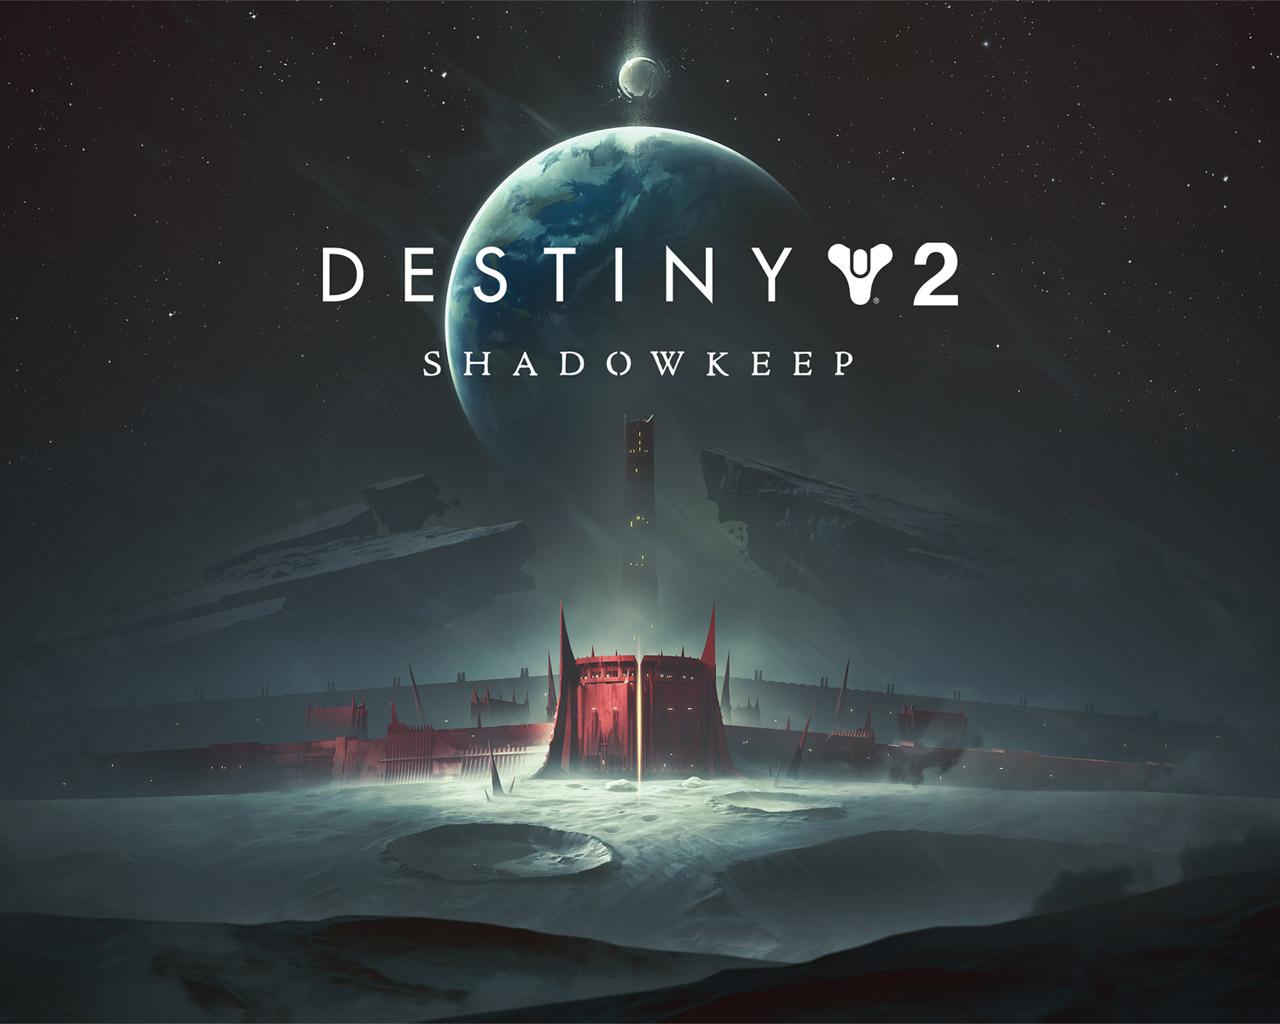 Destiny 2 Wallpaper in 1280x1024